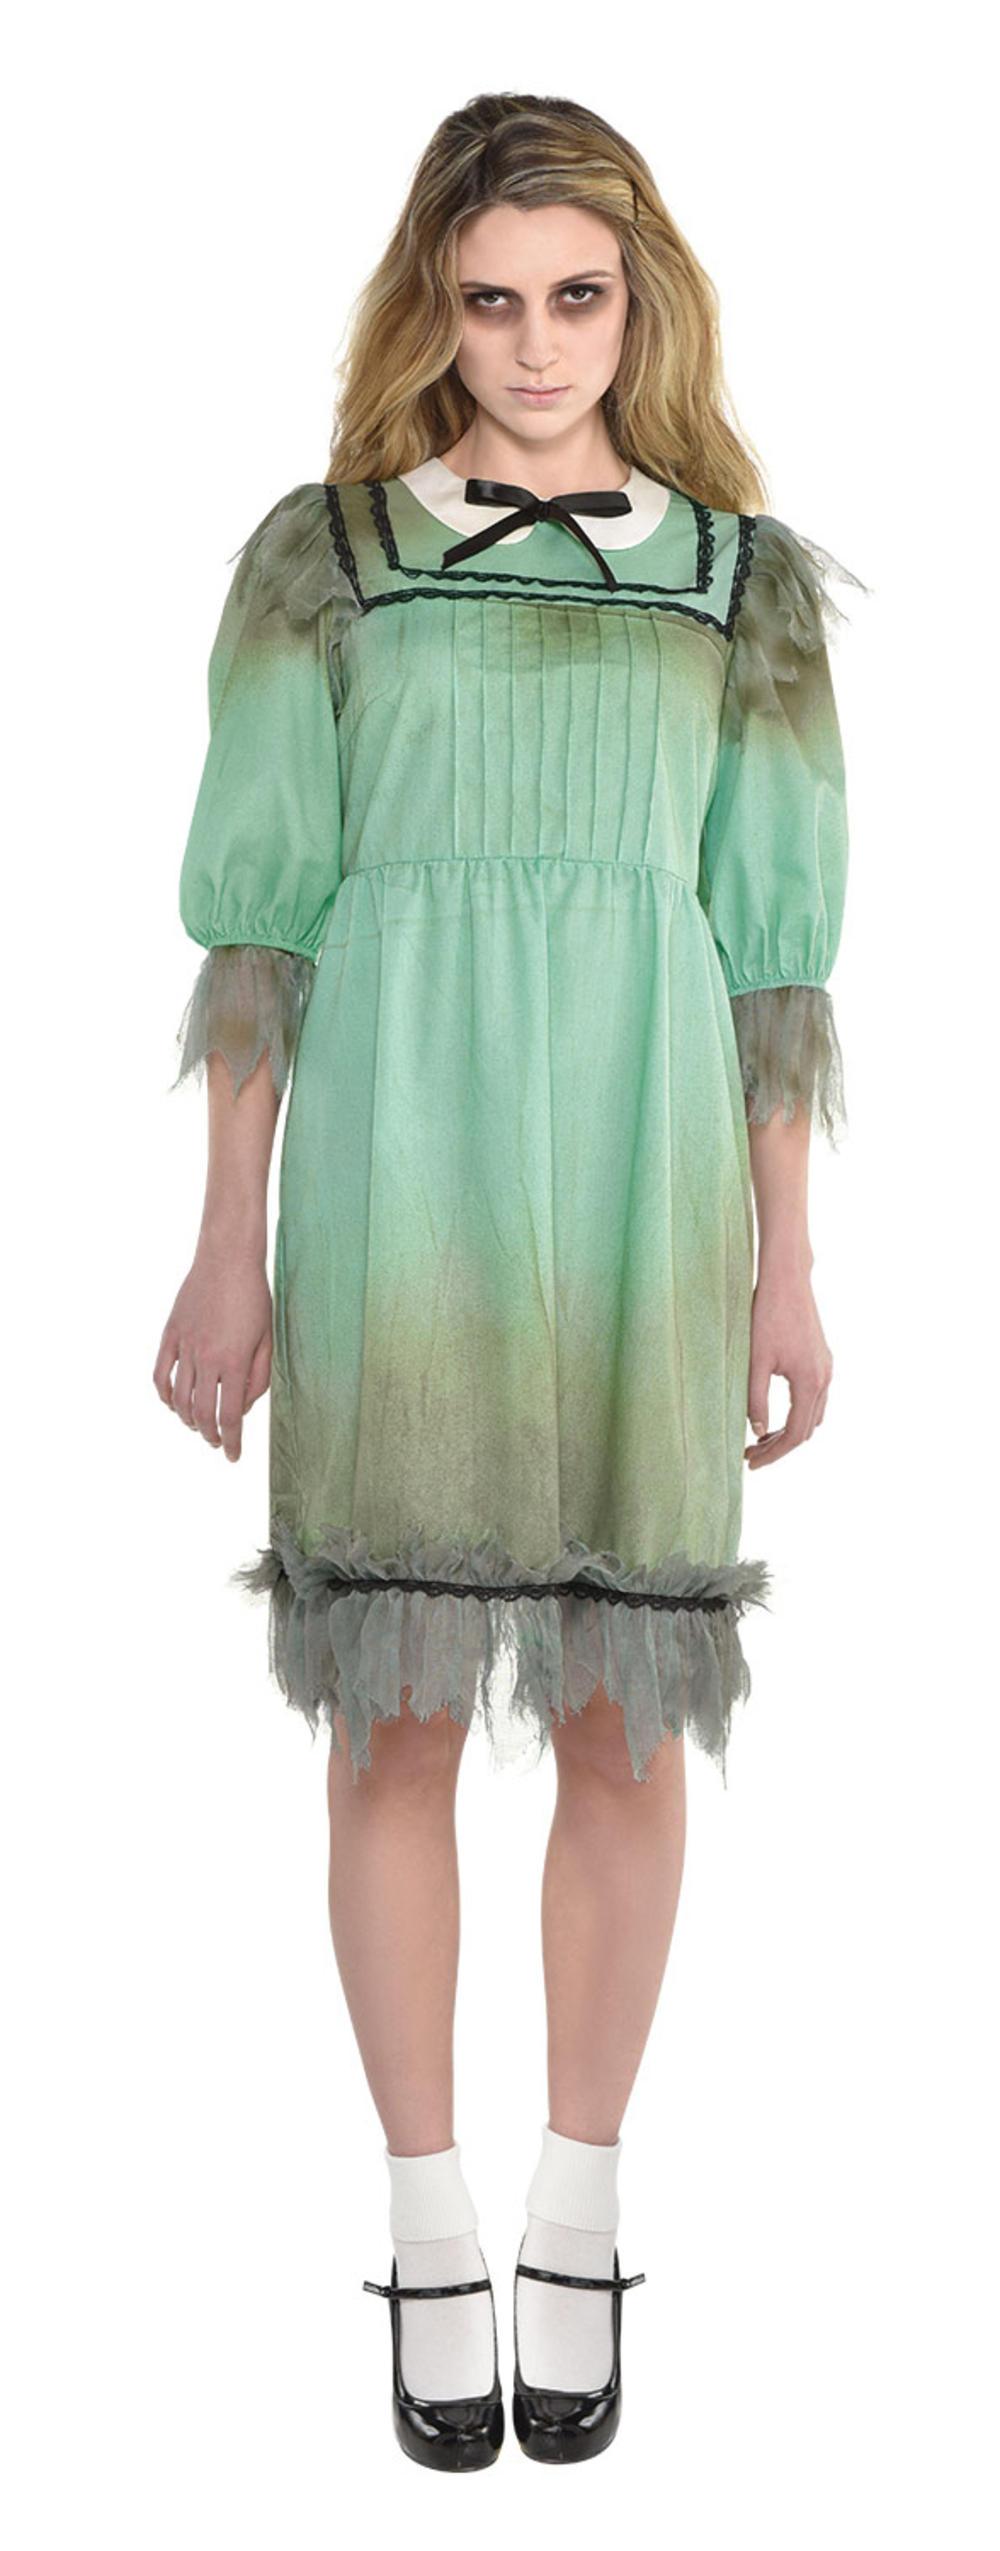 Dreadful Darling Ladies Costume